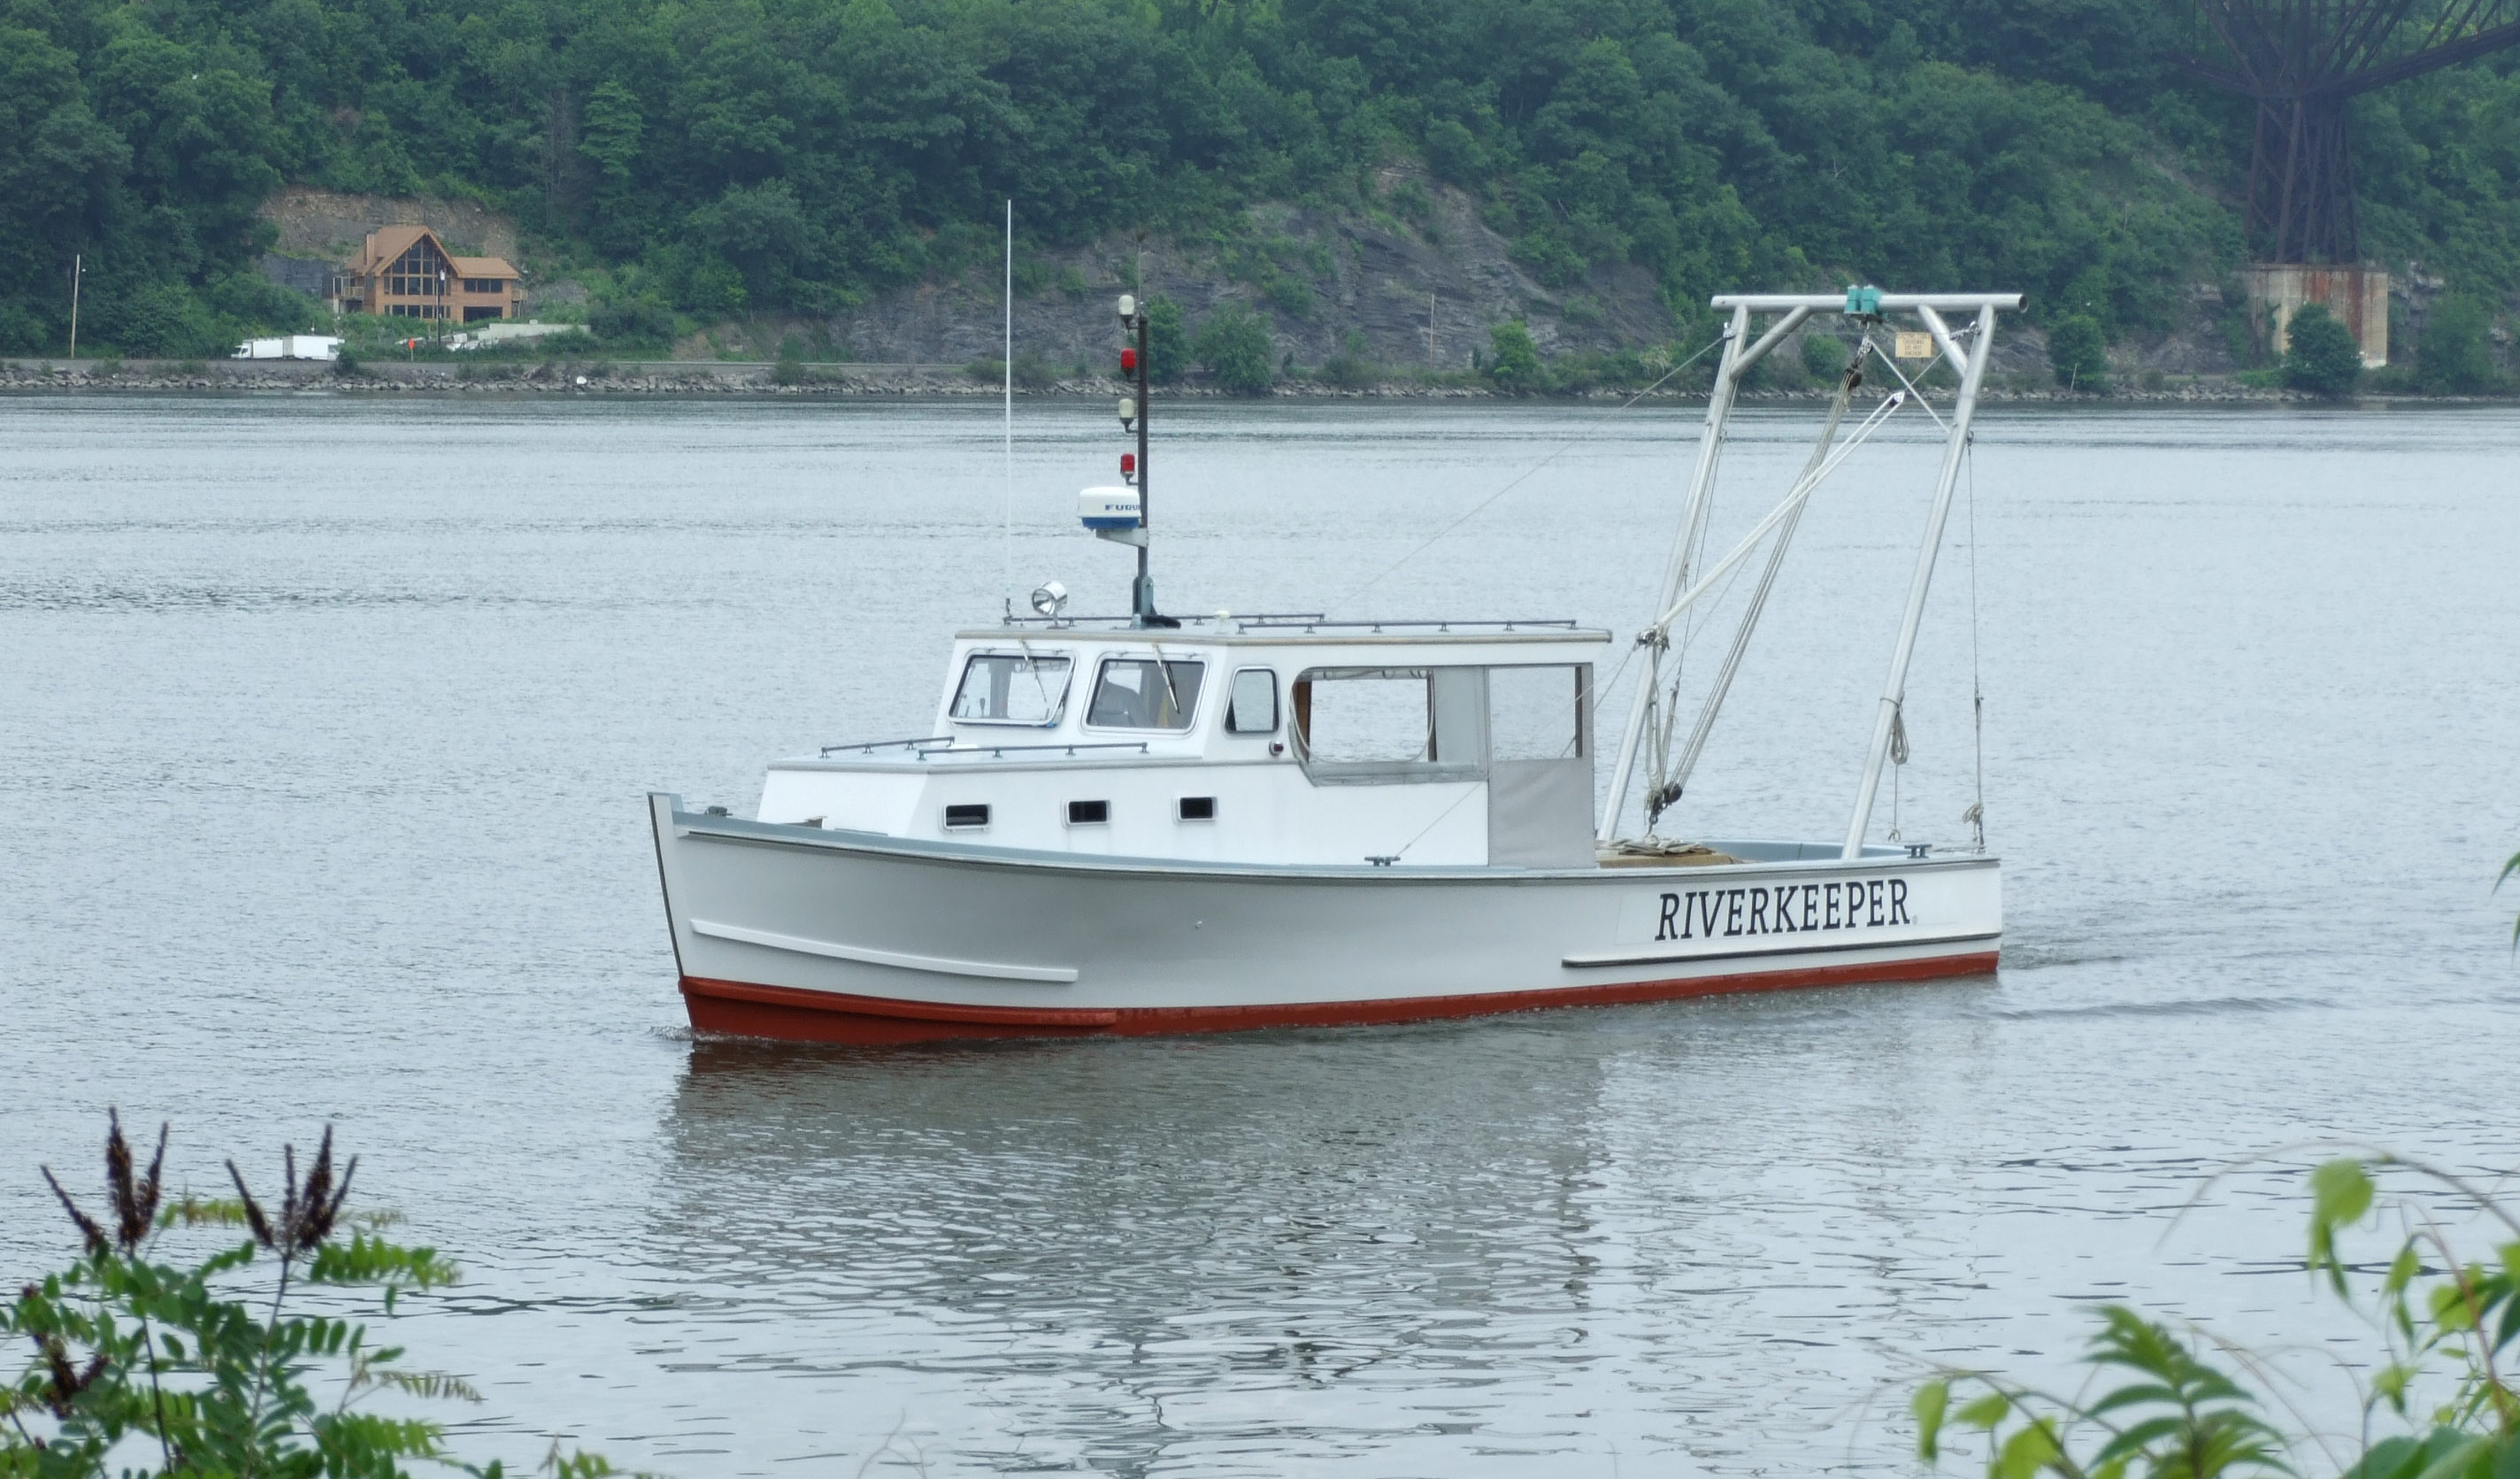 Patrol Boat - Riverkeeper